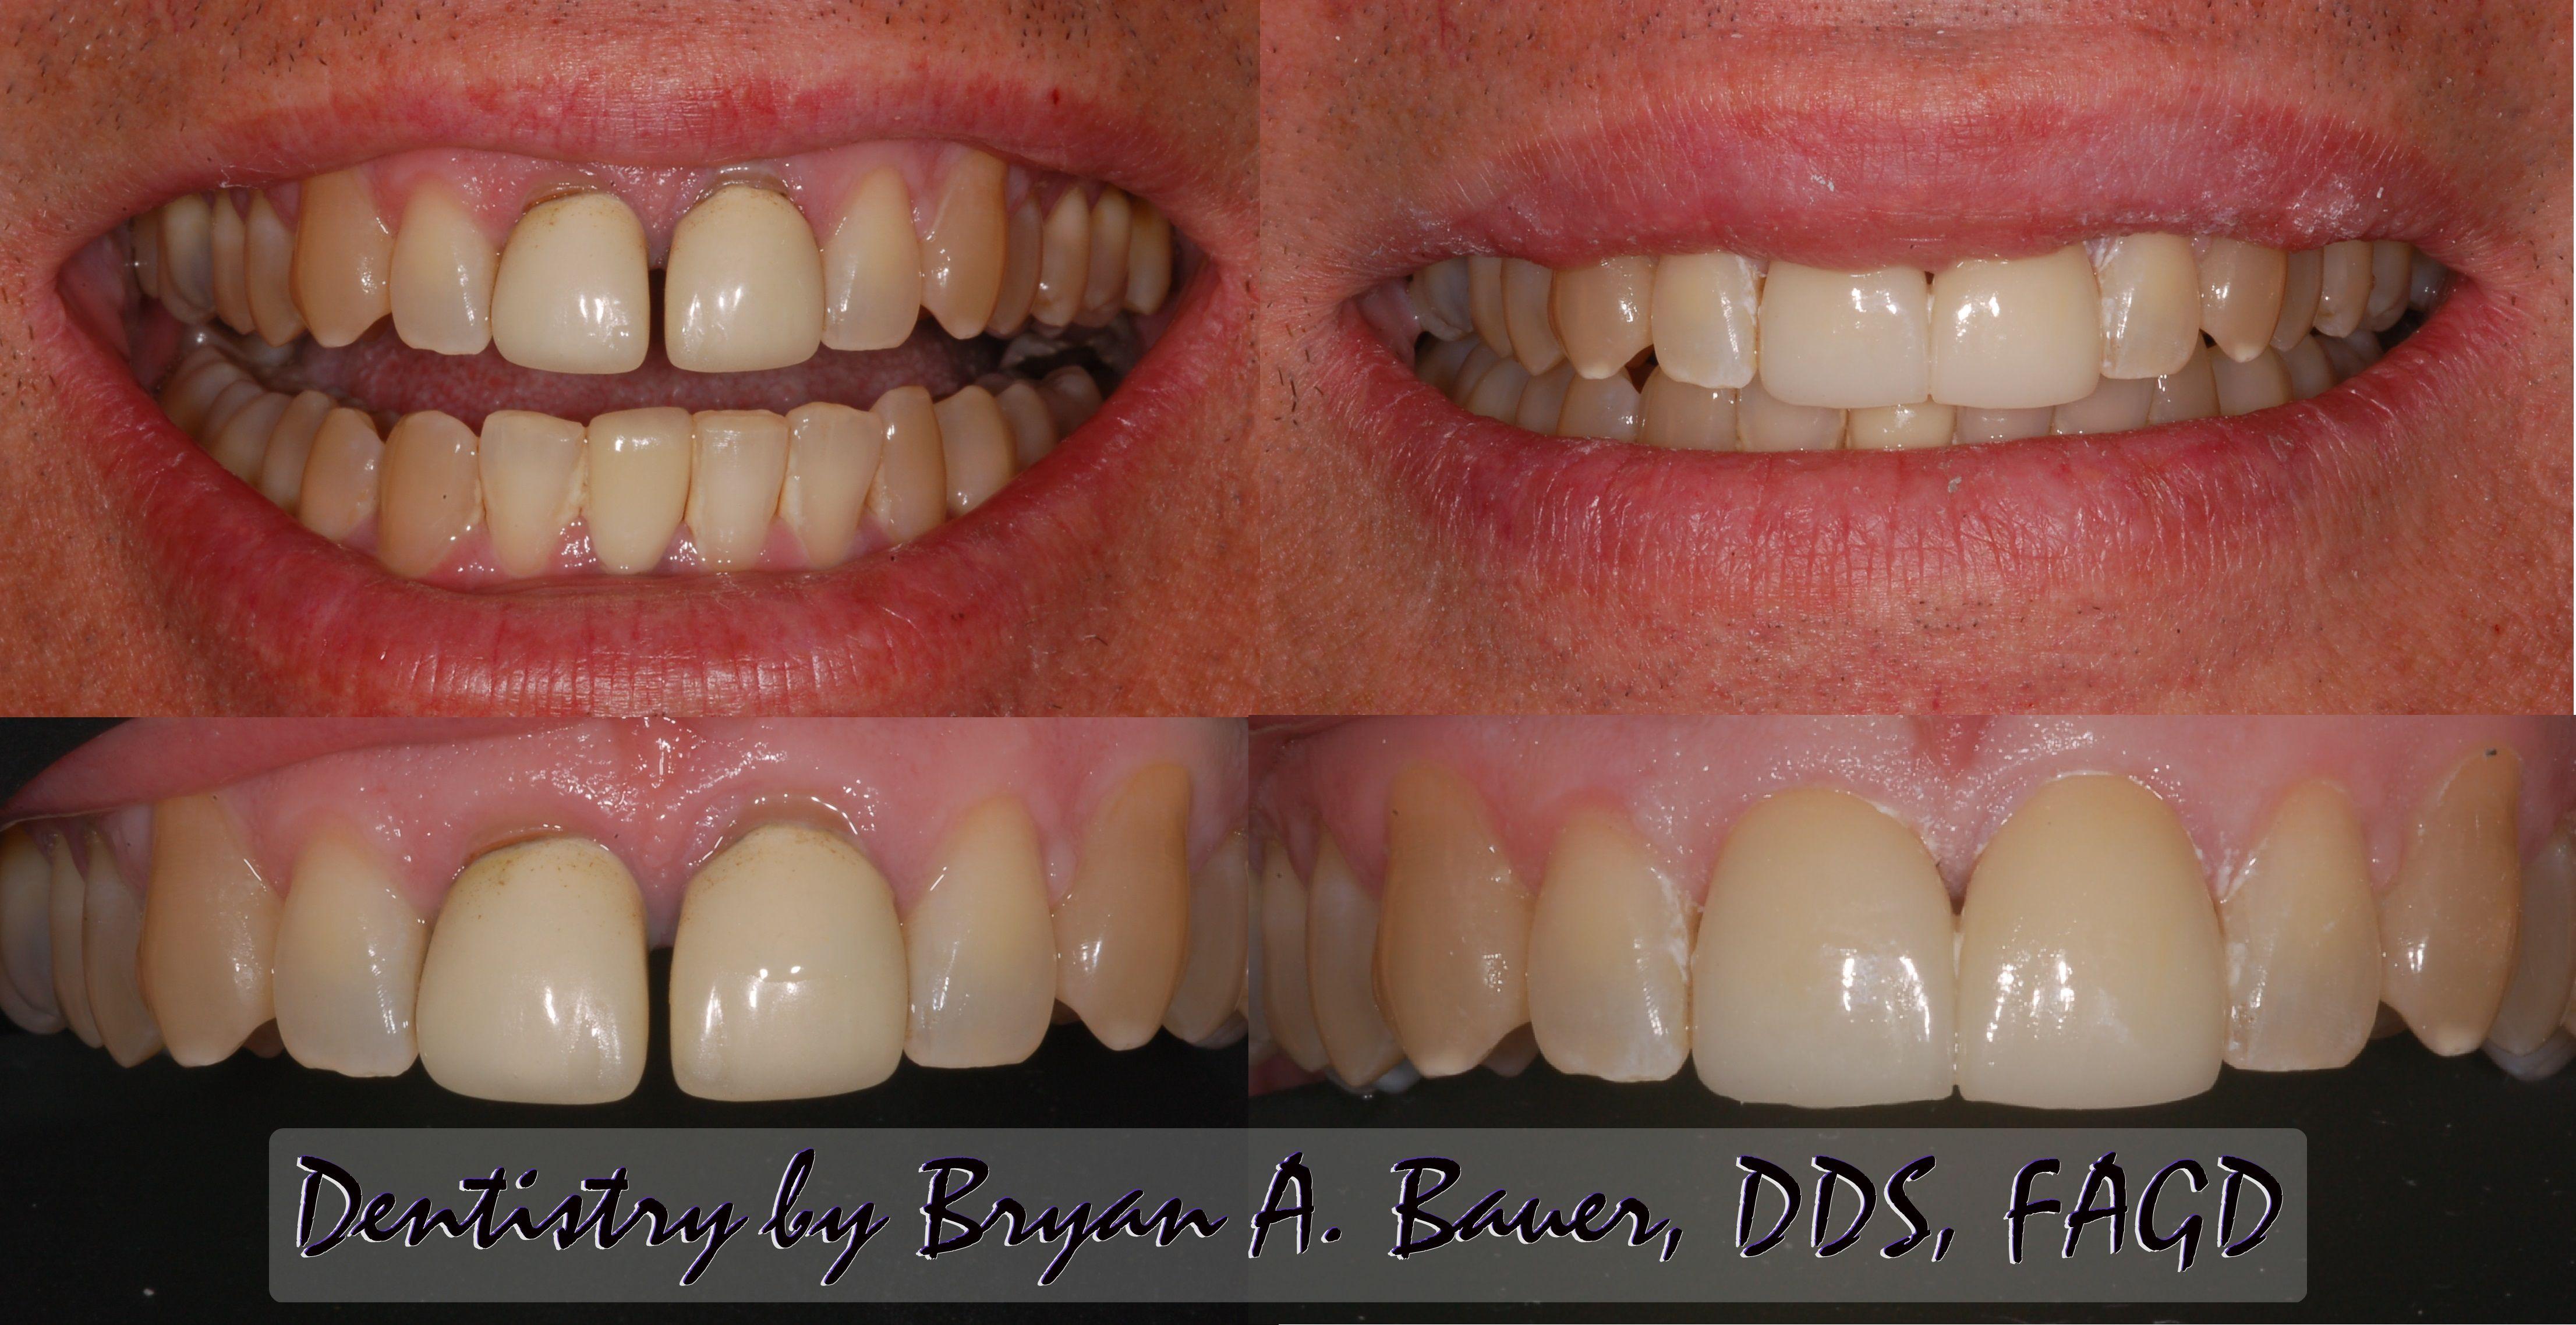 New porcelain crowns - Bauer Smiles